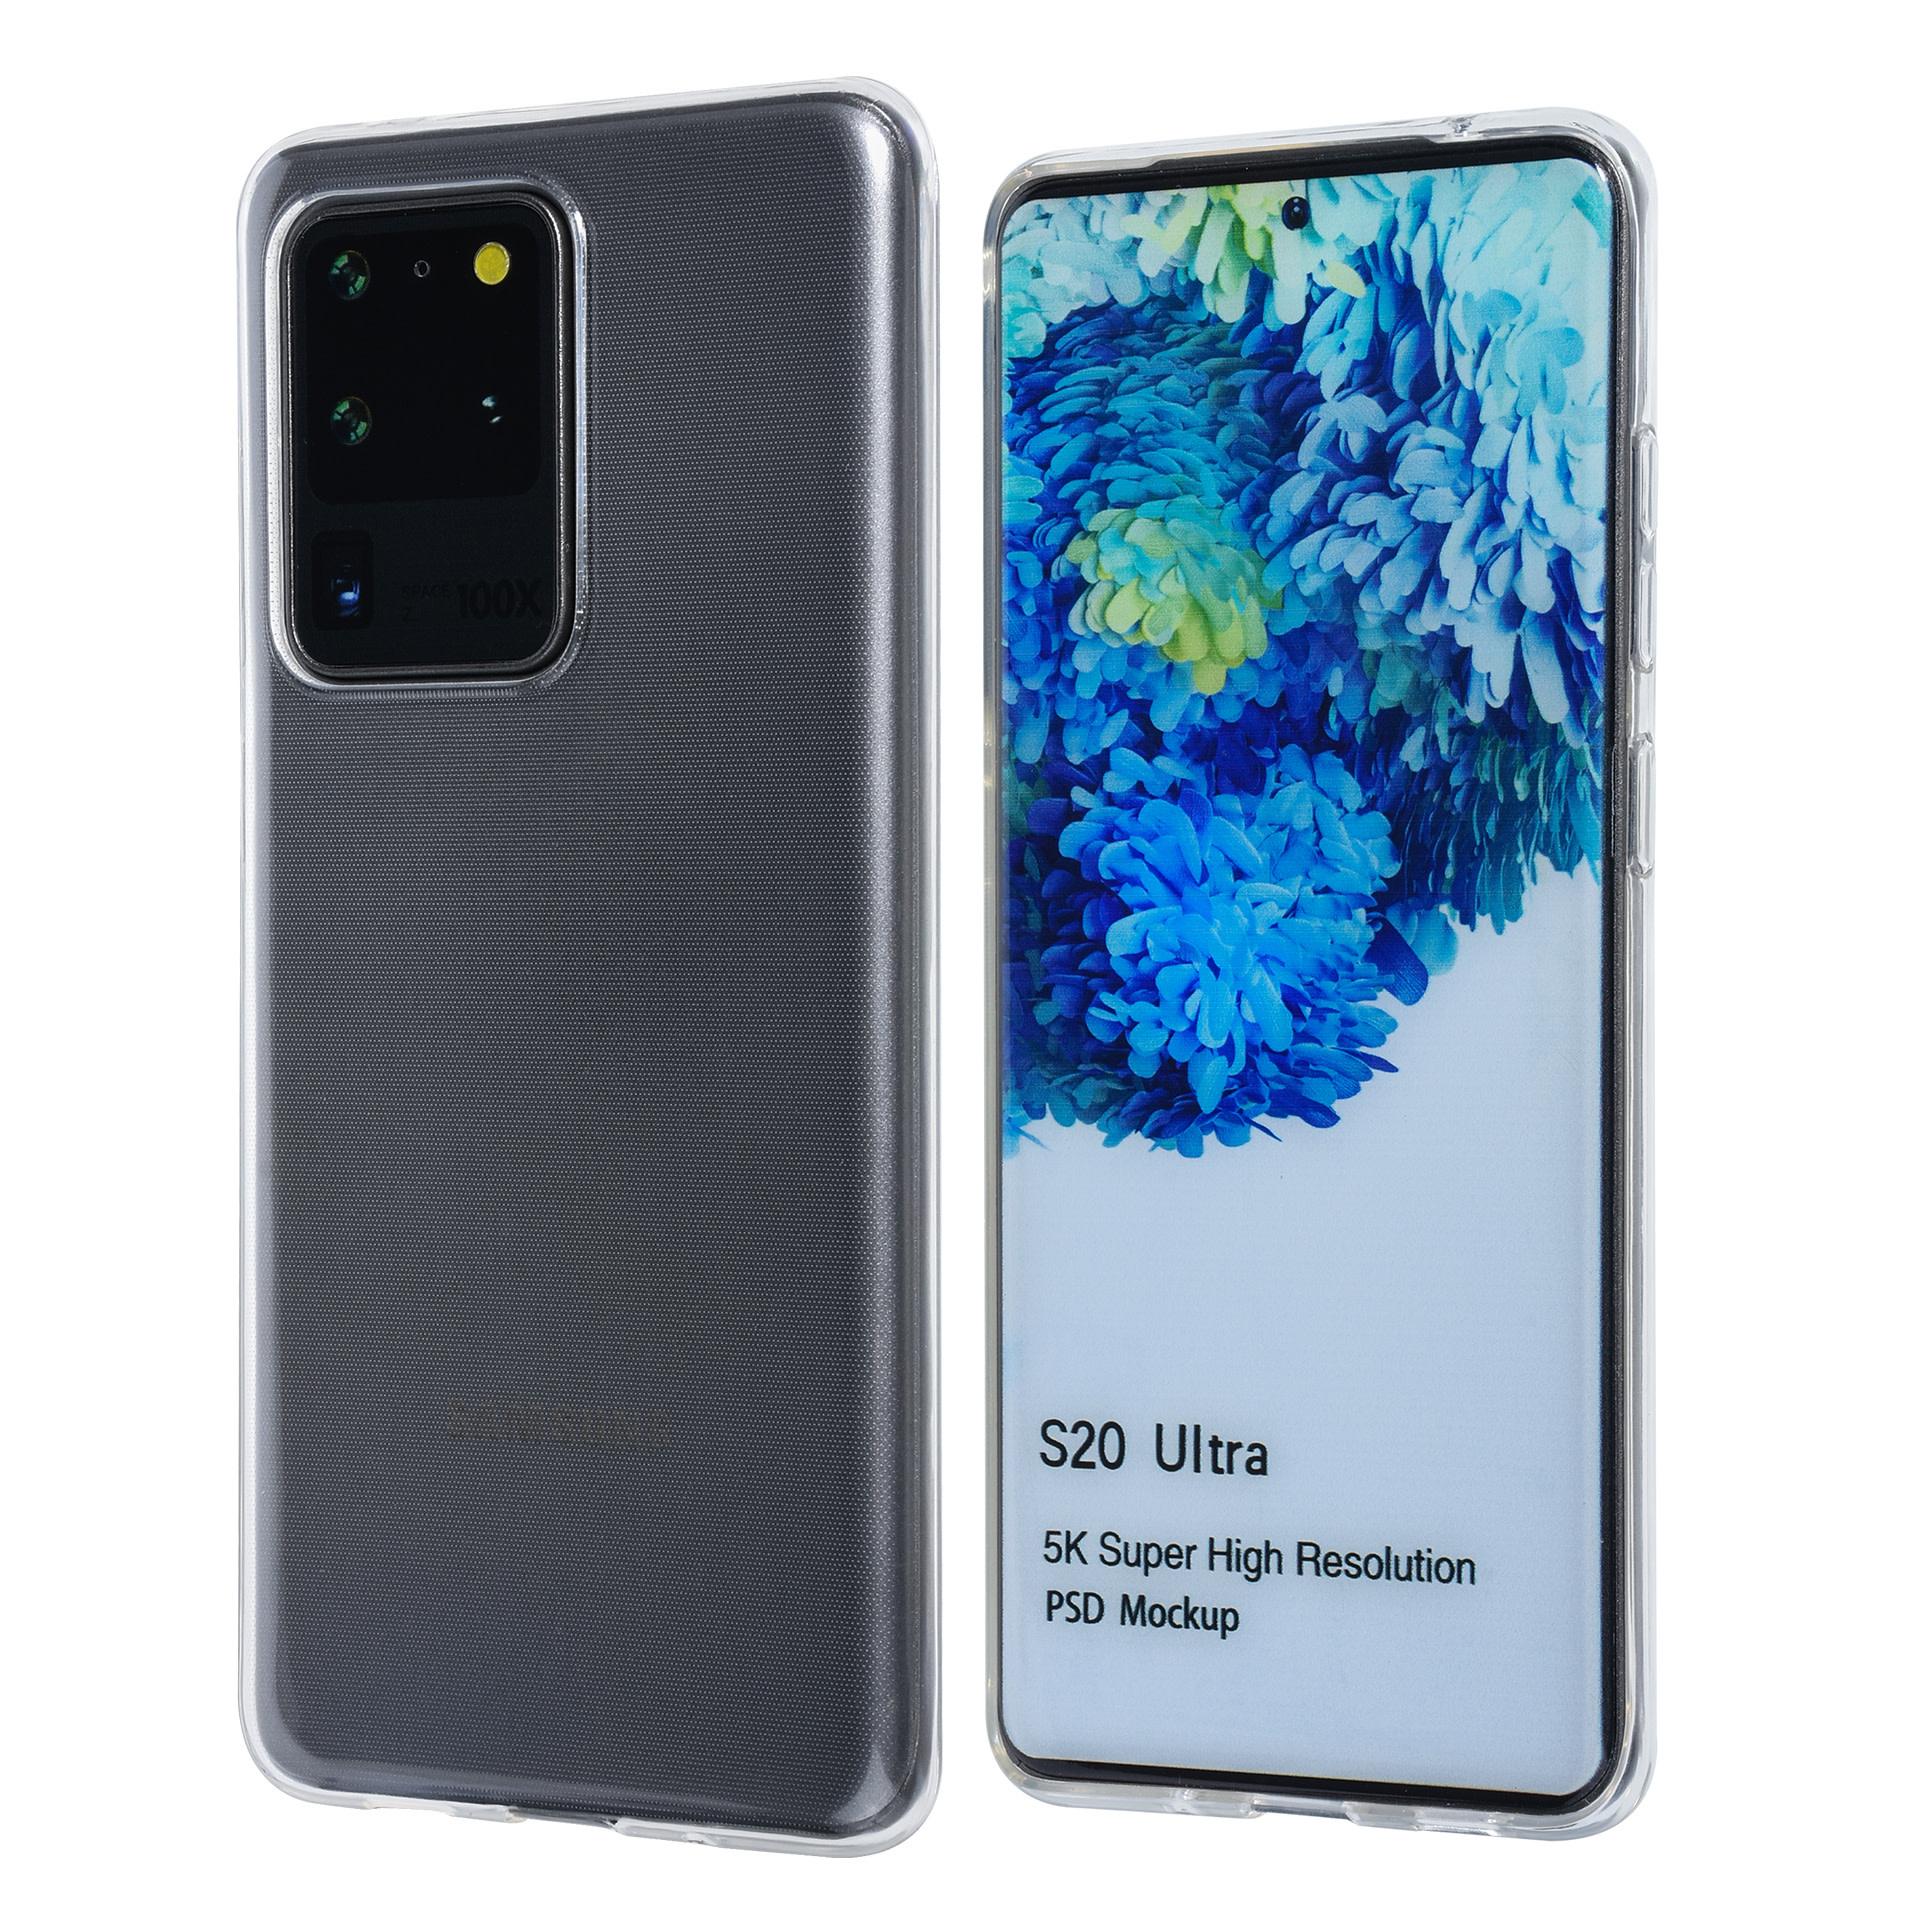 Samsung Galaxy S20 Ultra Transparent Back-Cover hul - Sanfte Berührung